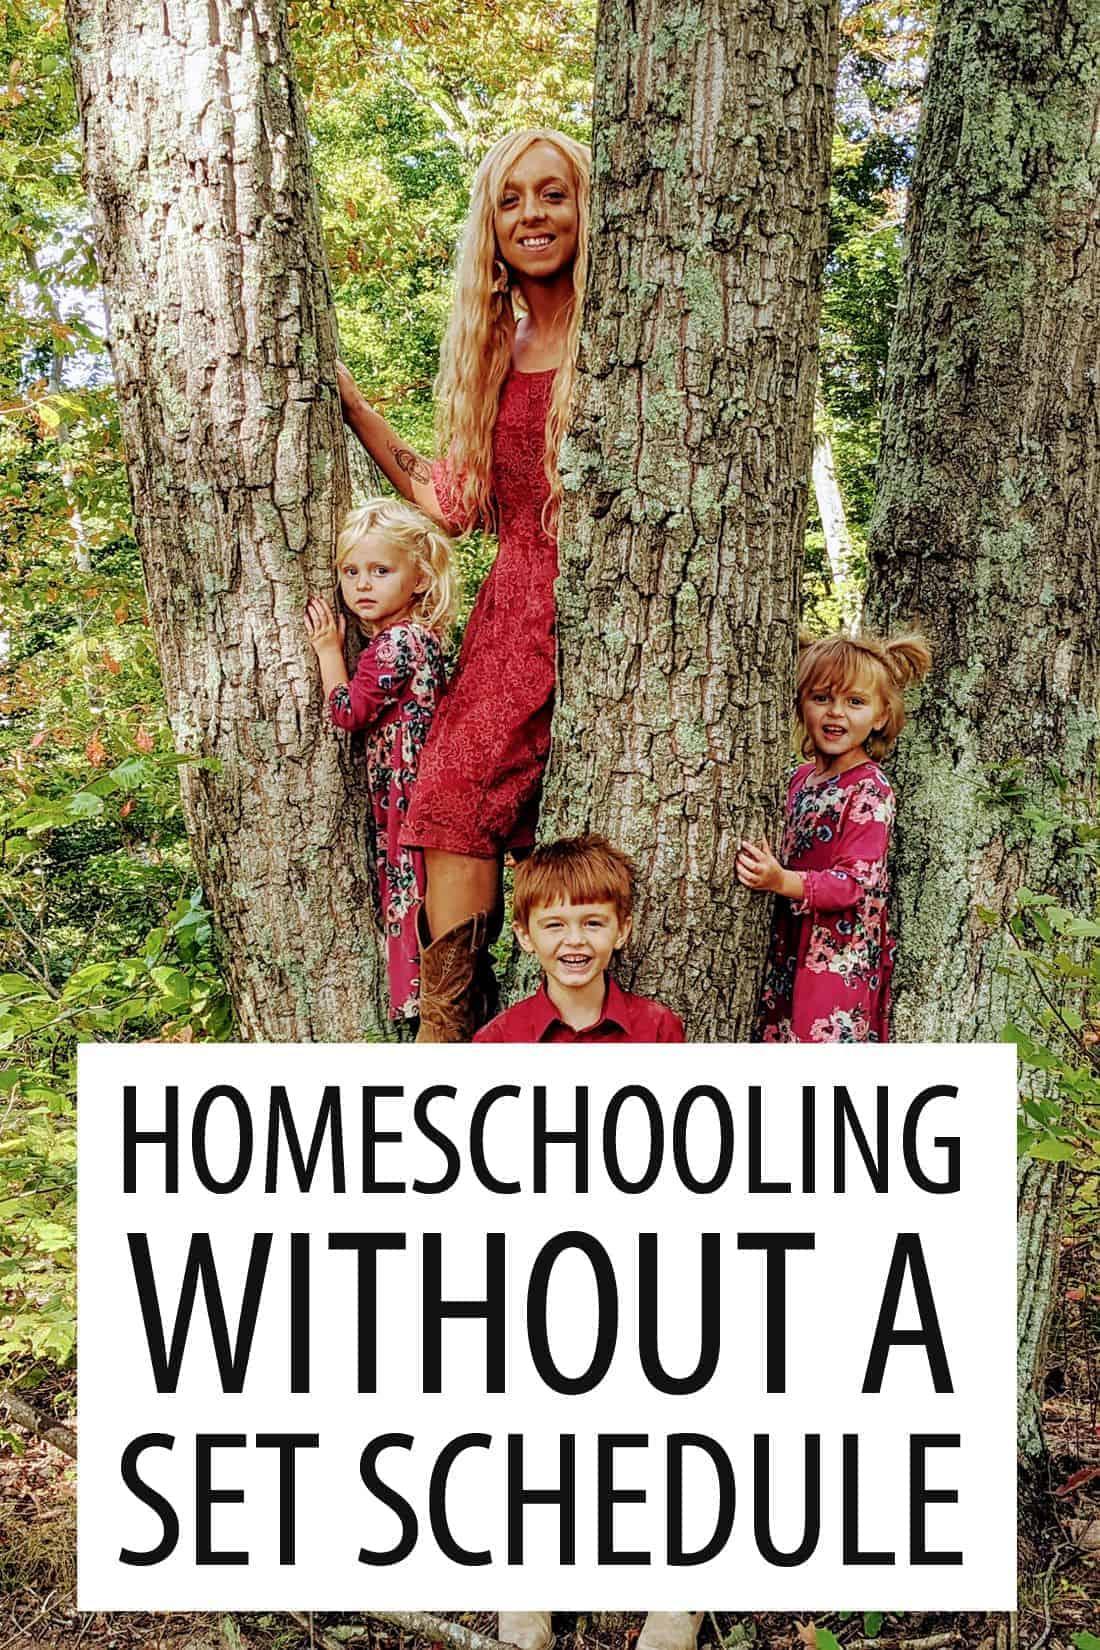 homeschool without schedule pinterest